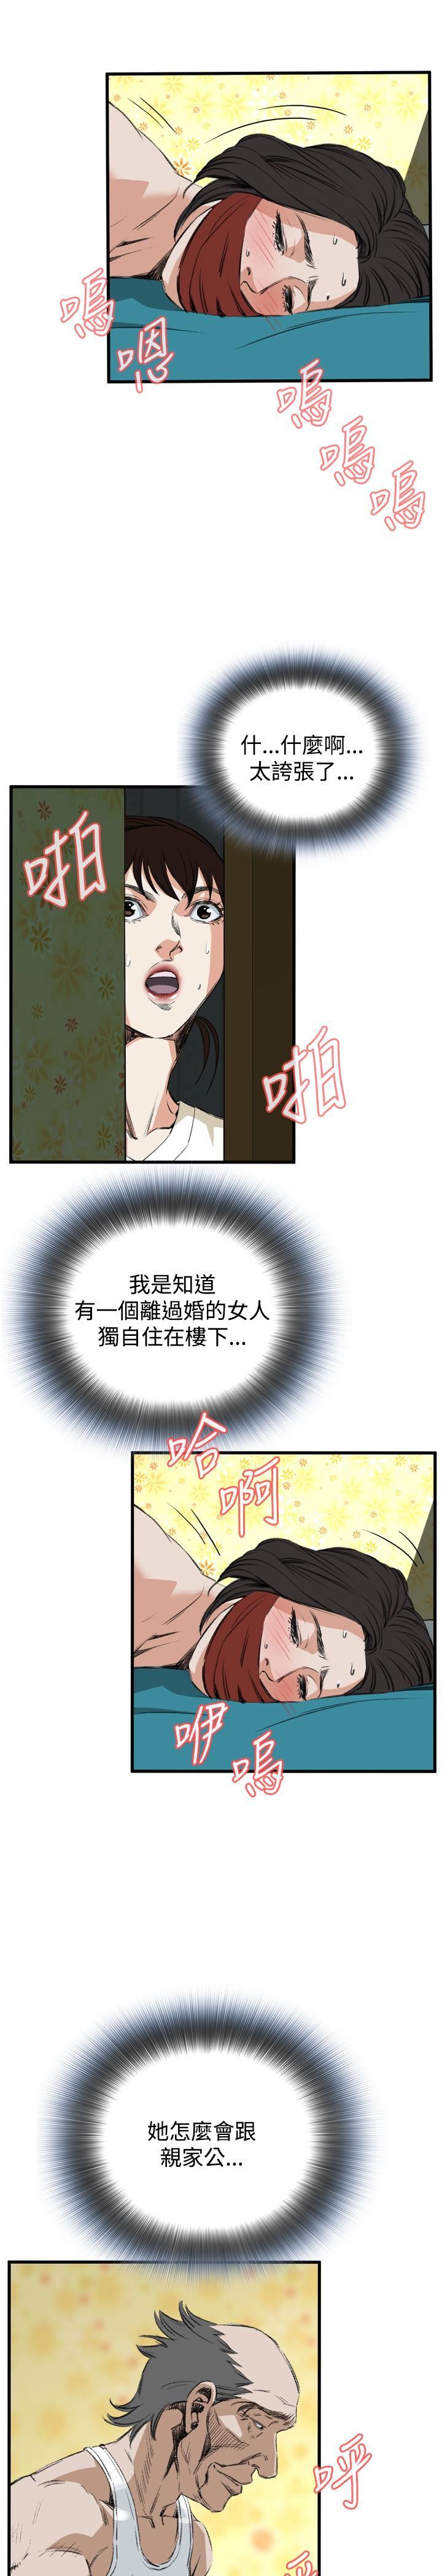 Take a Peek 偷窥 Ch.39~60 [Chinese]中文 161